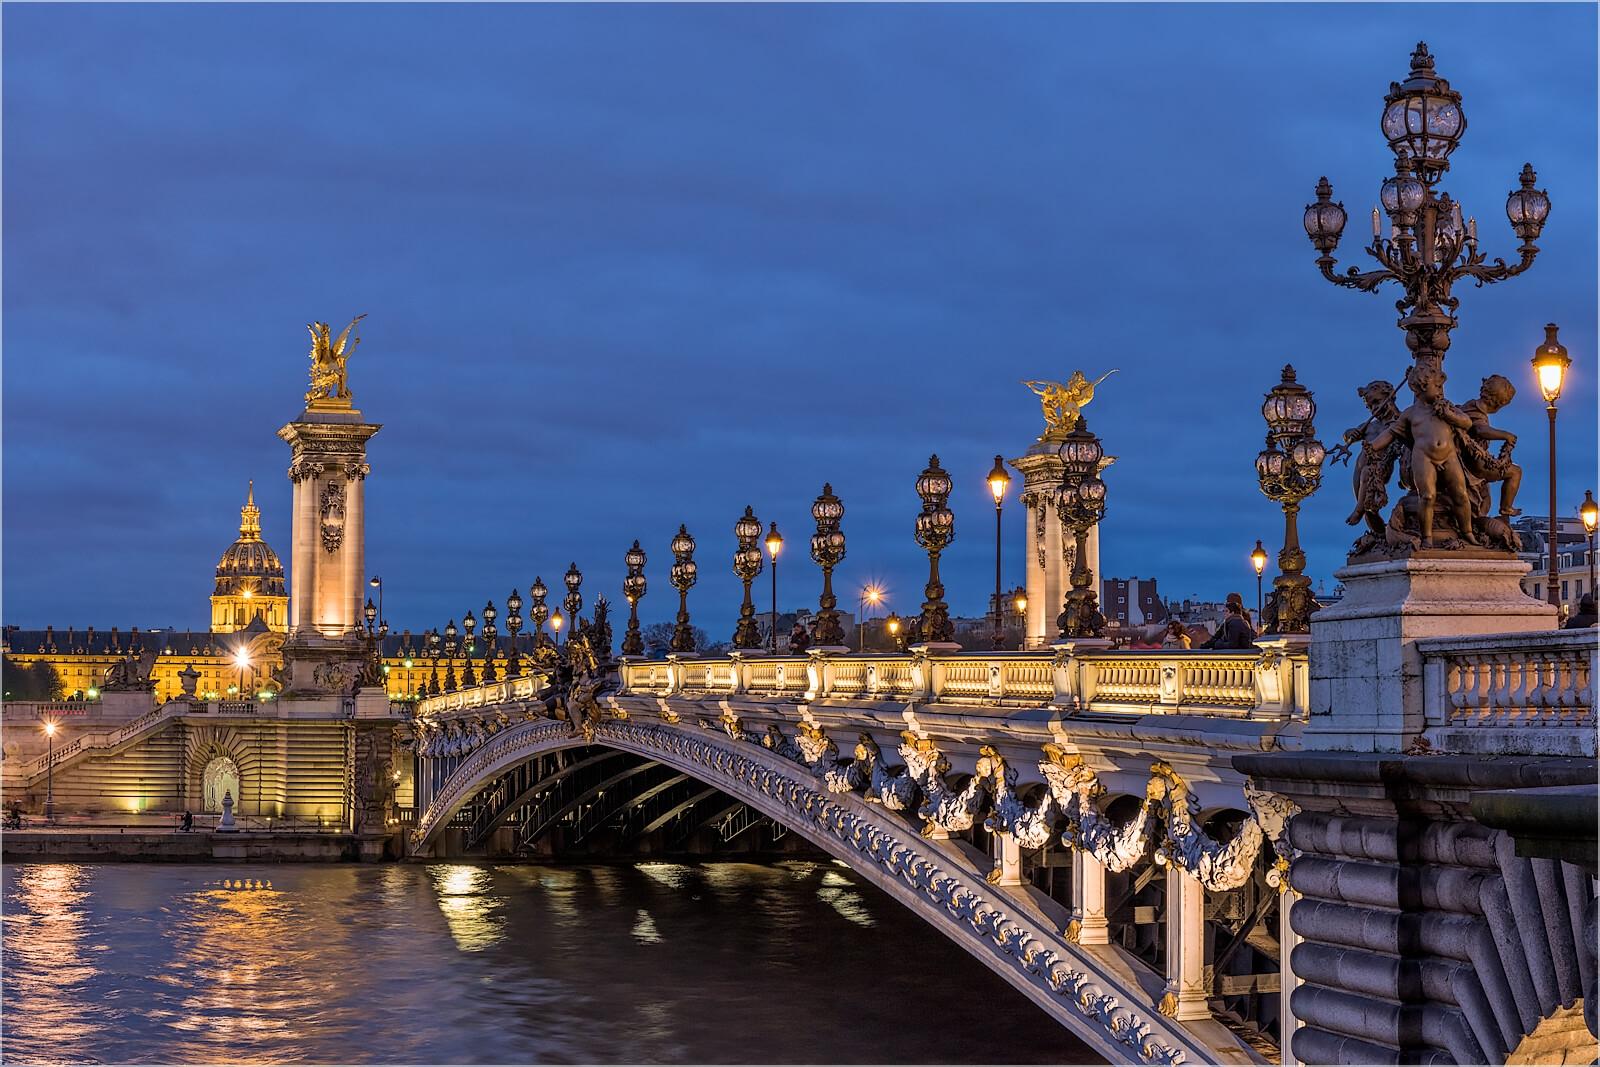 Wanddeko Am Pont Alexandre III Paris